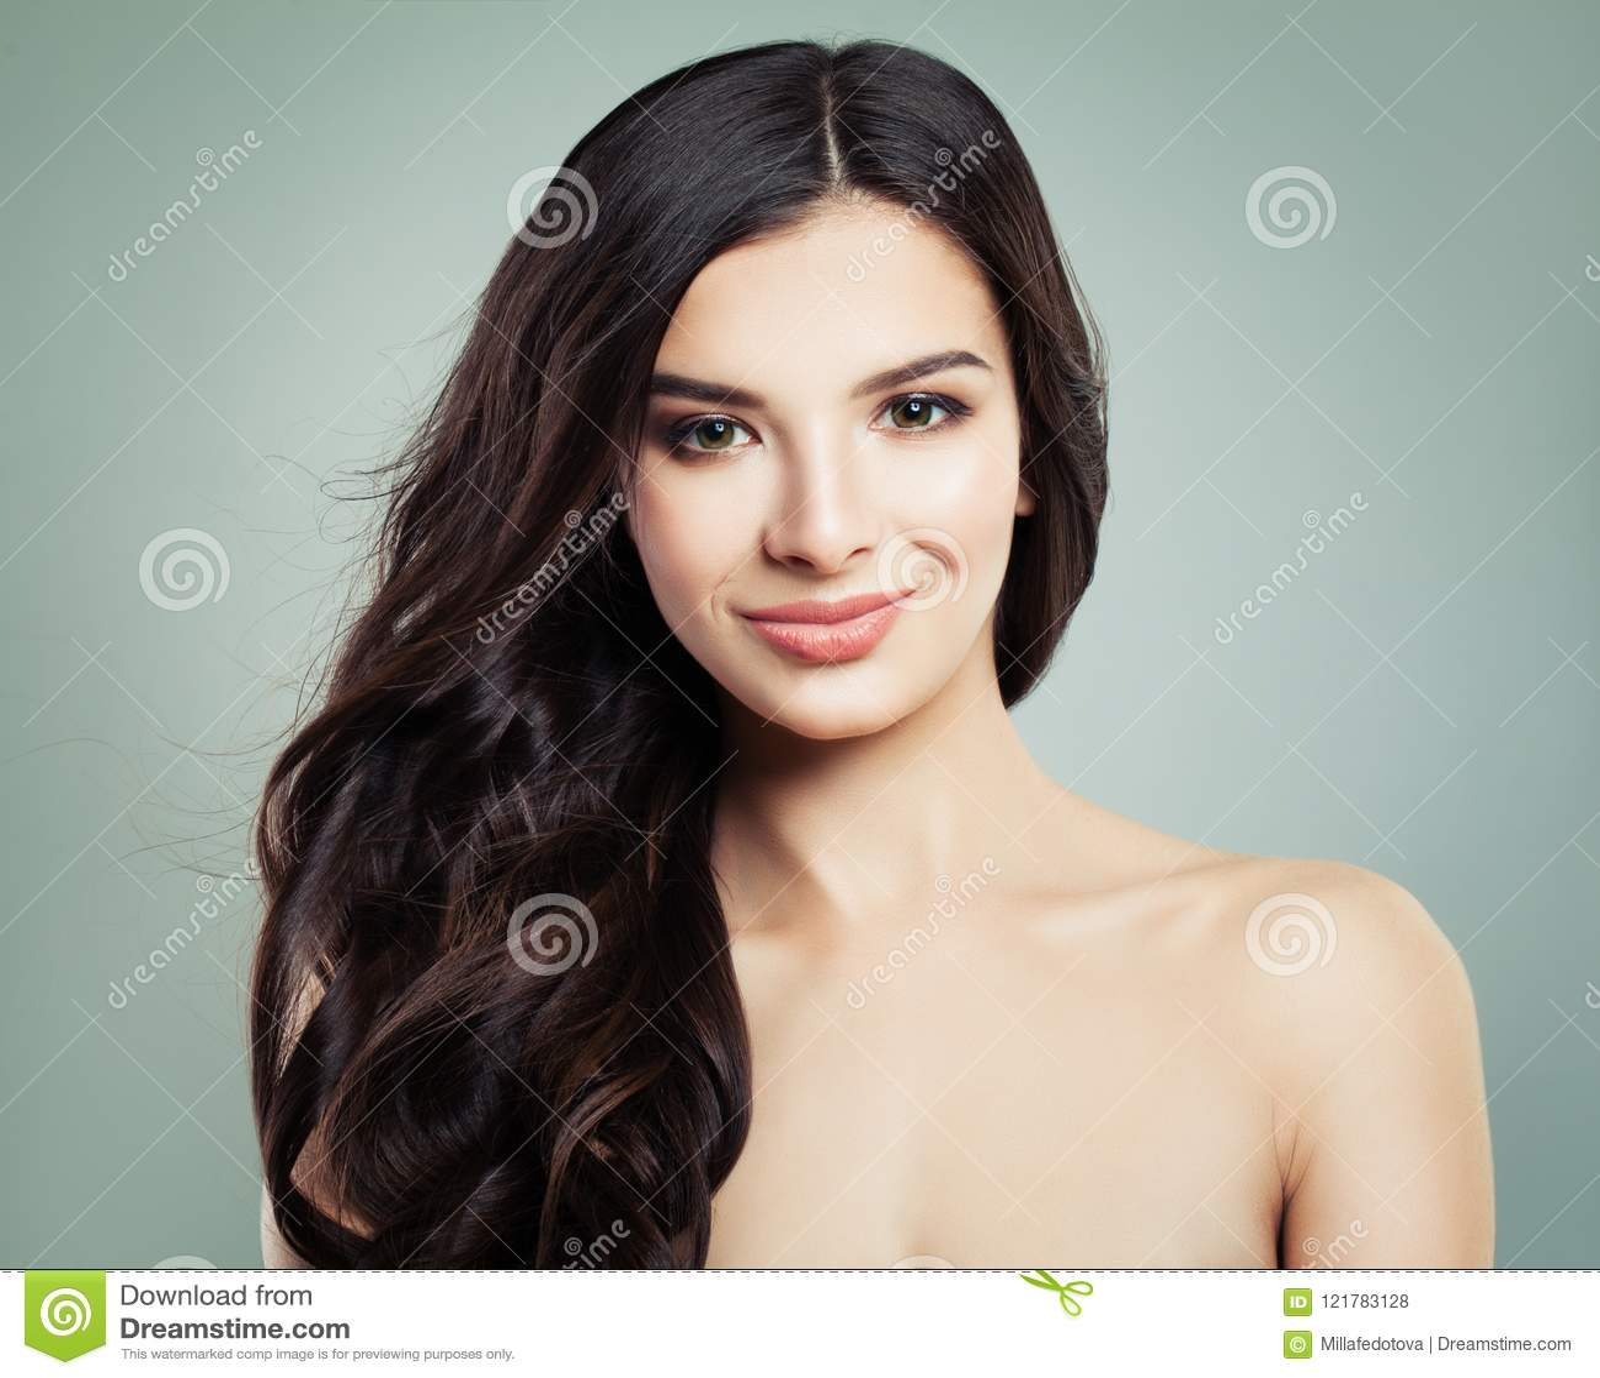 Brunette Hair Woman Smiling. Natural Makeup and Long Hair